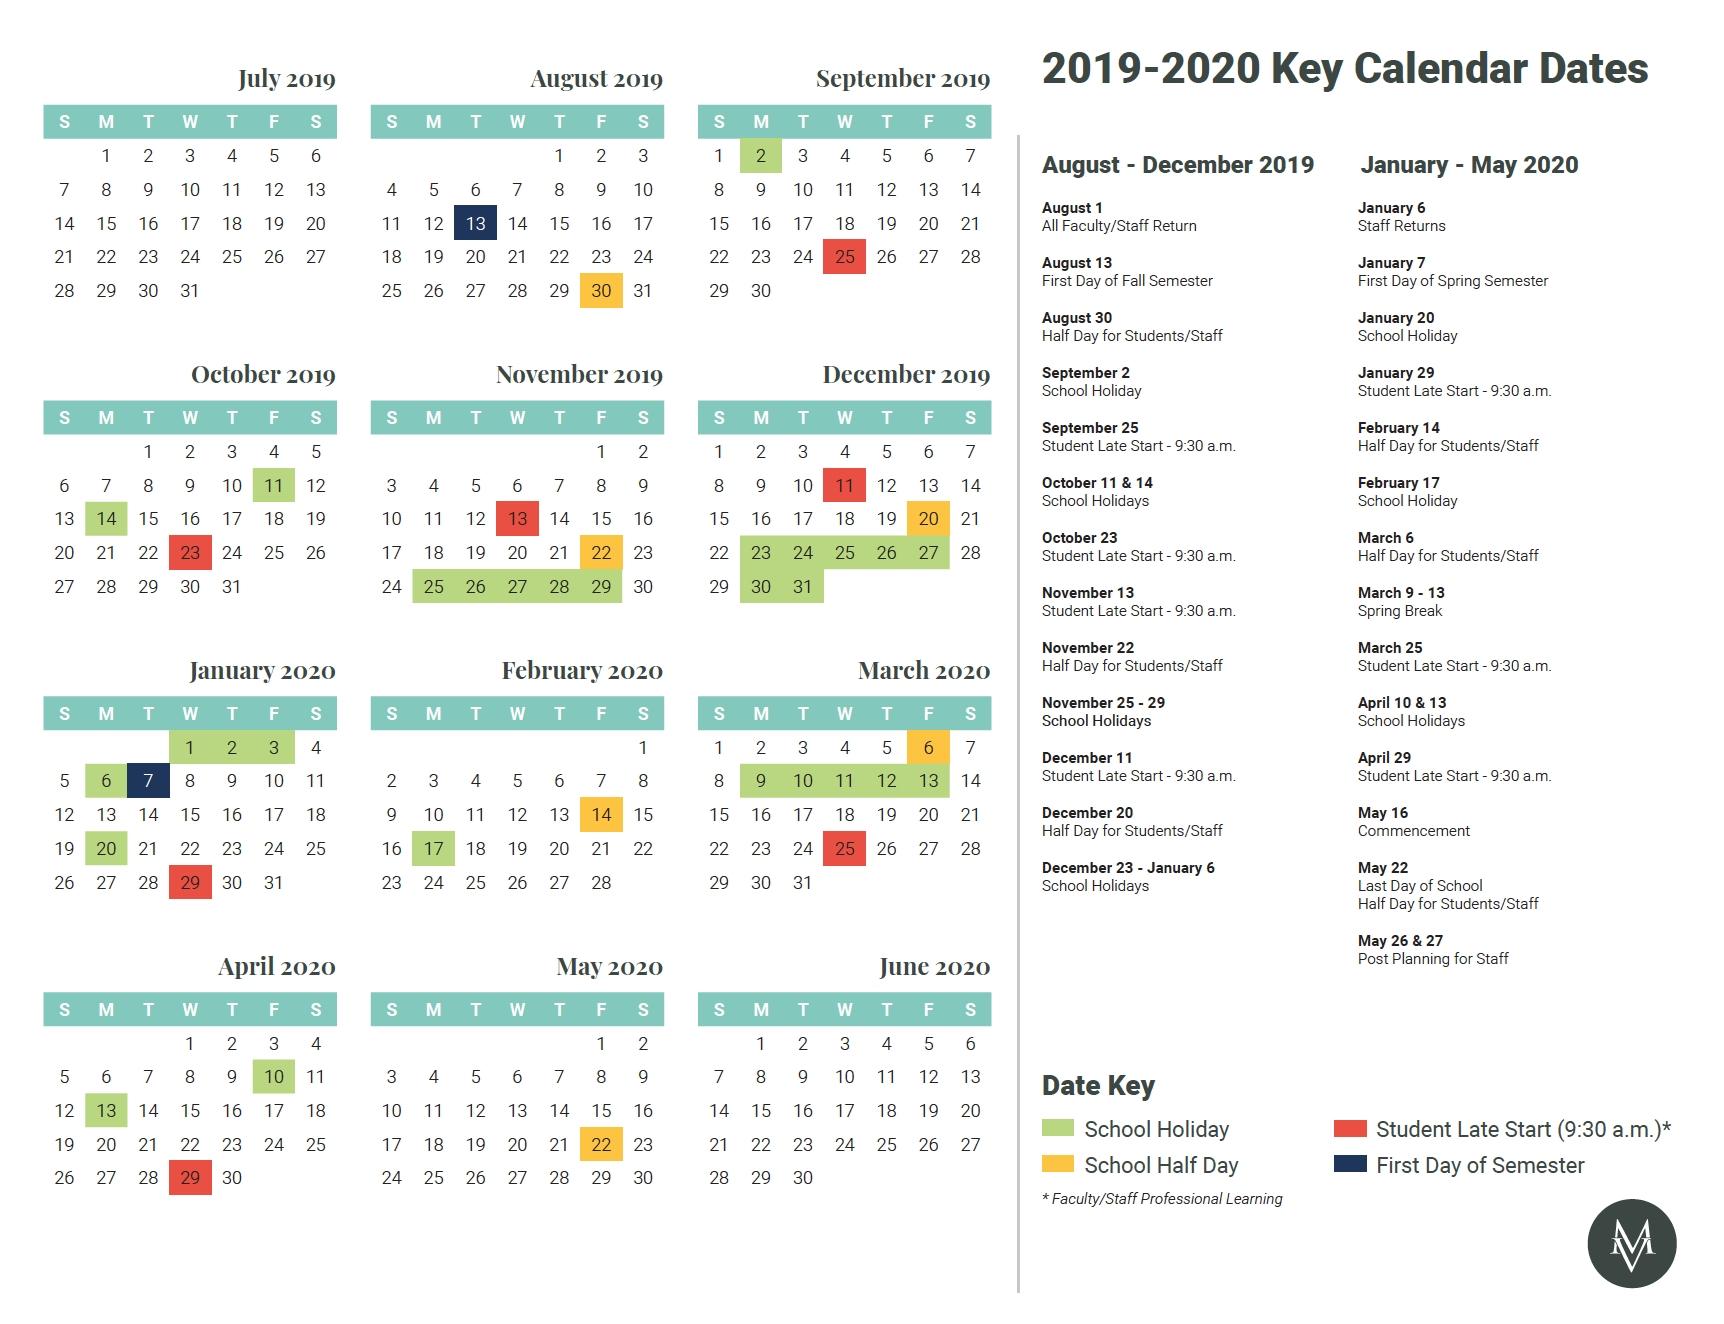 Key Calendar Dates 2019-2020 – Mount Vernon Lookup intended for Calendar 2019-2020 Important Dates